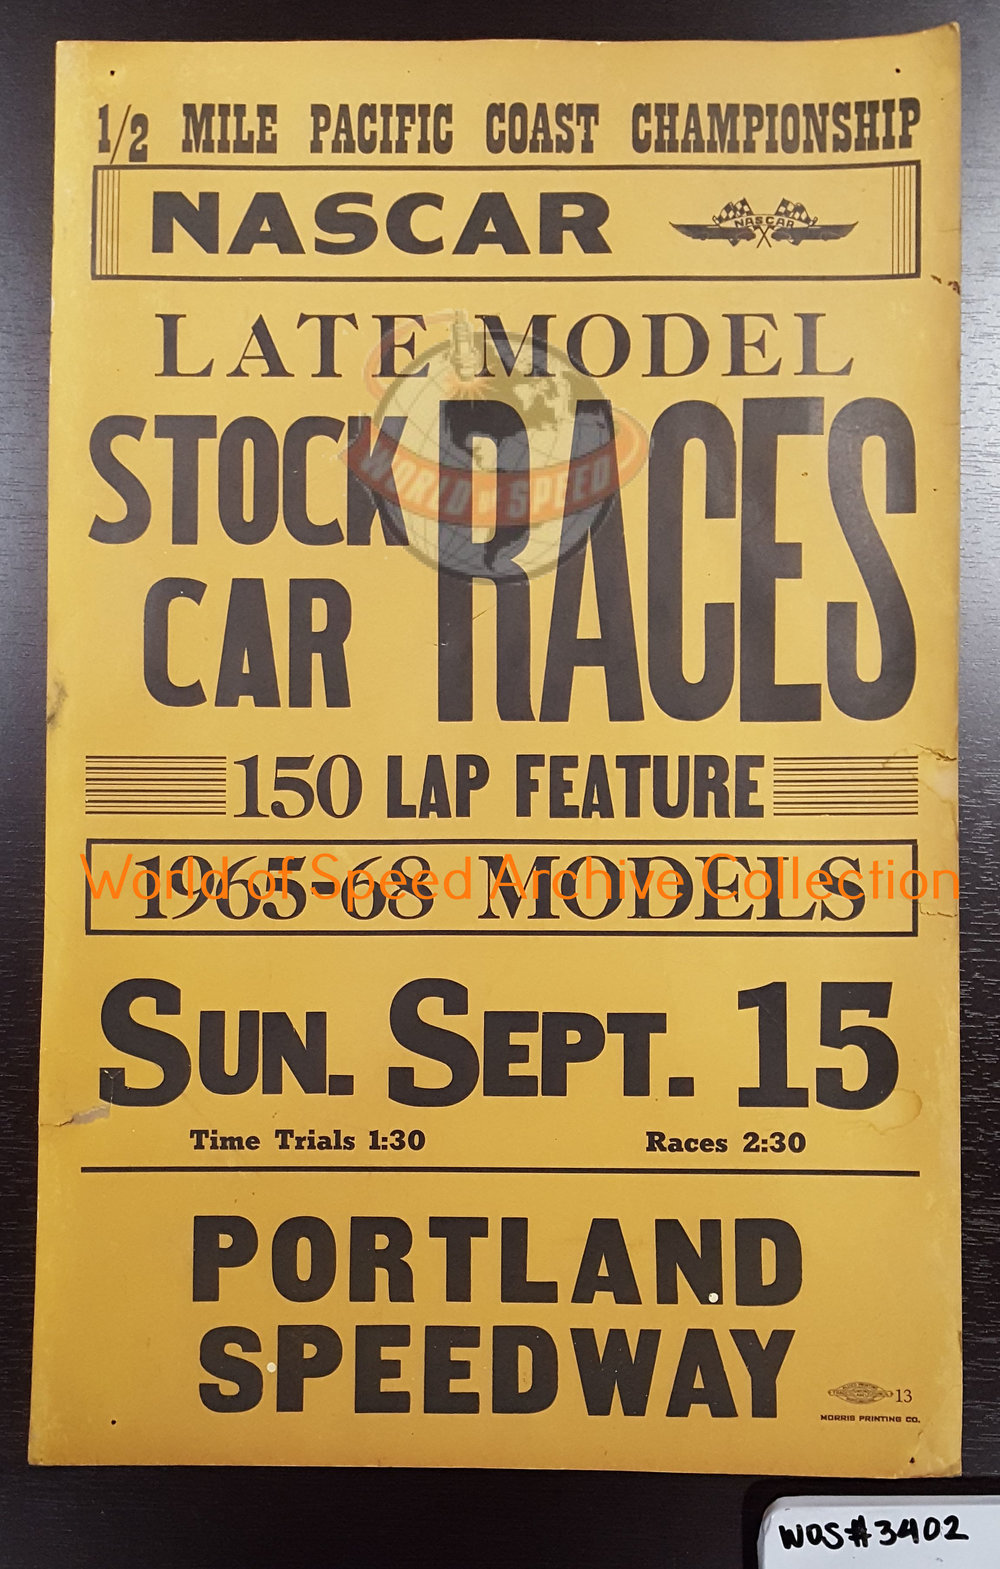 1968 Pacific Coast Championship poster